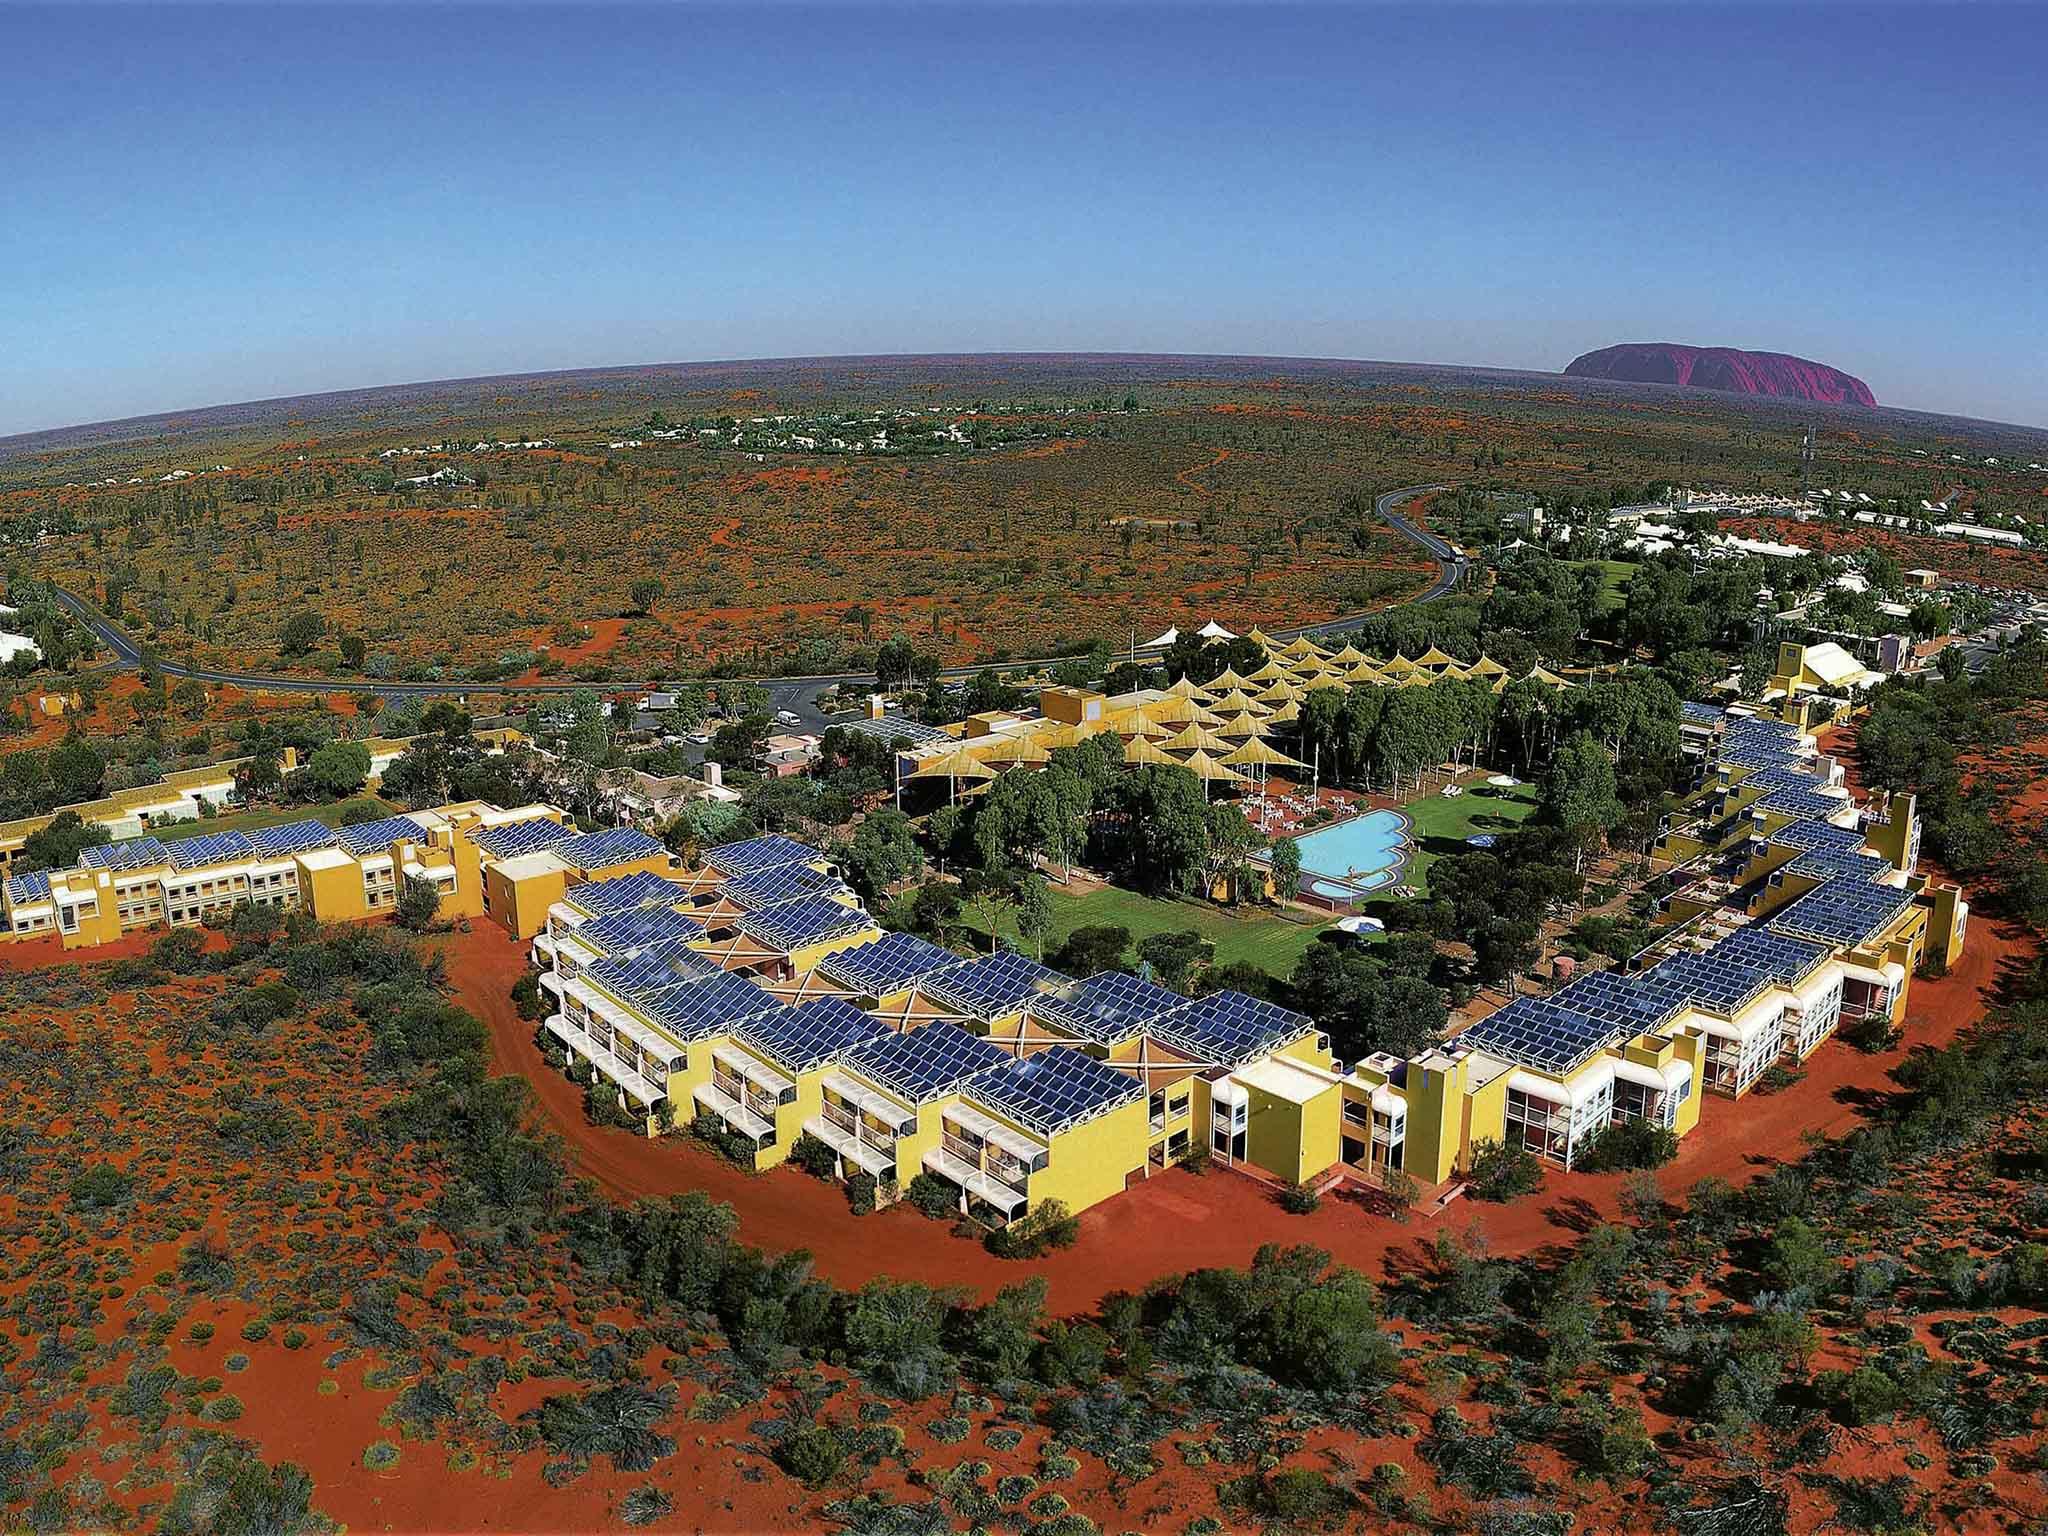 Hôtel - Desert Gardens - A member of Novotel Hotels